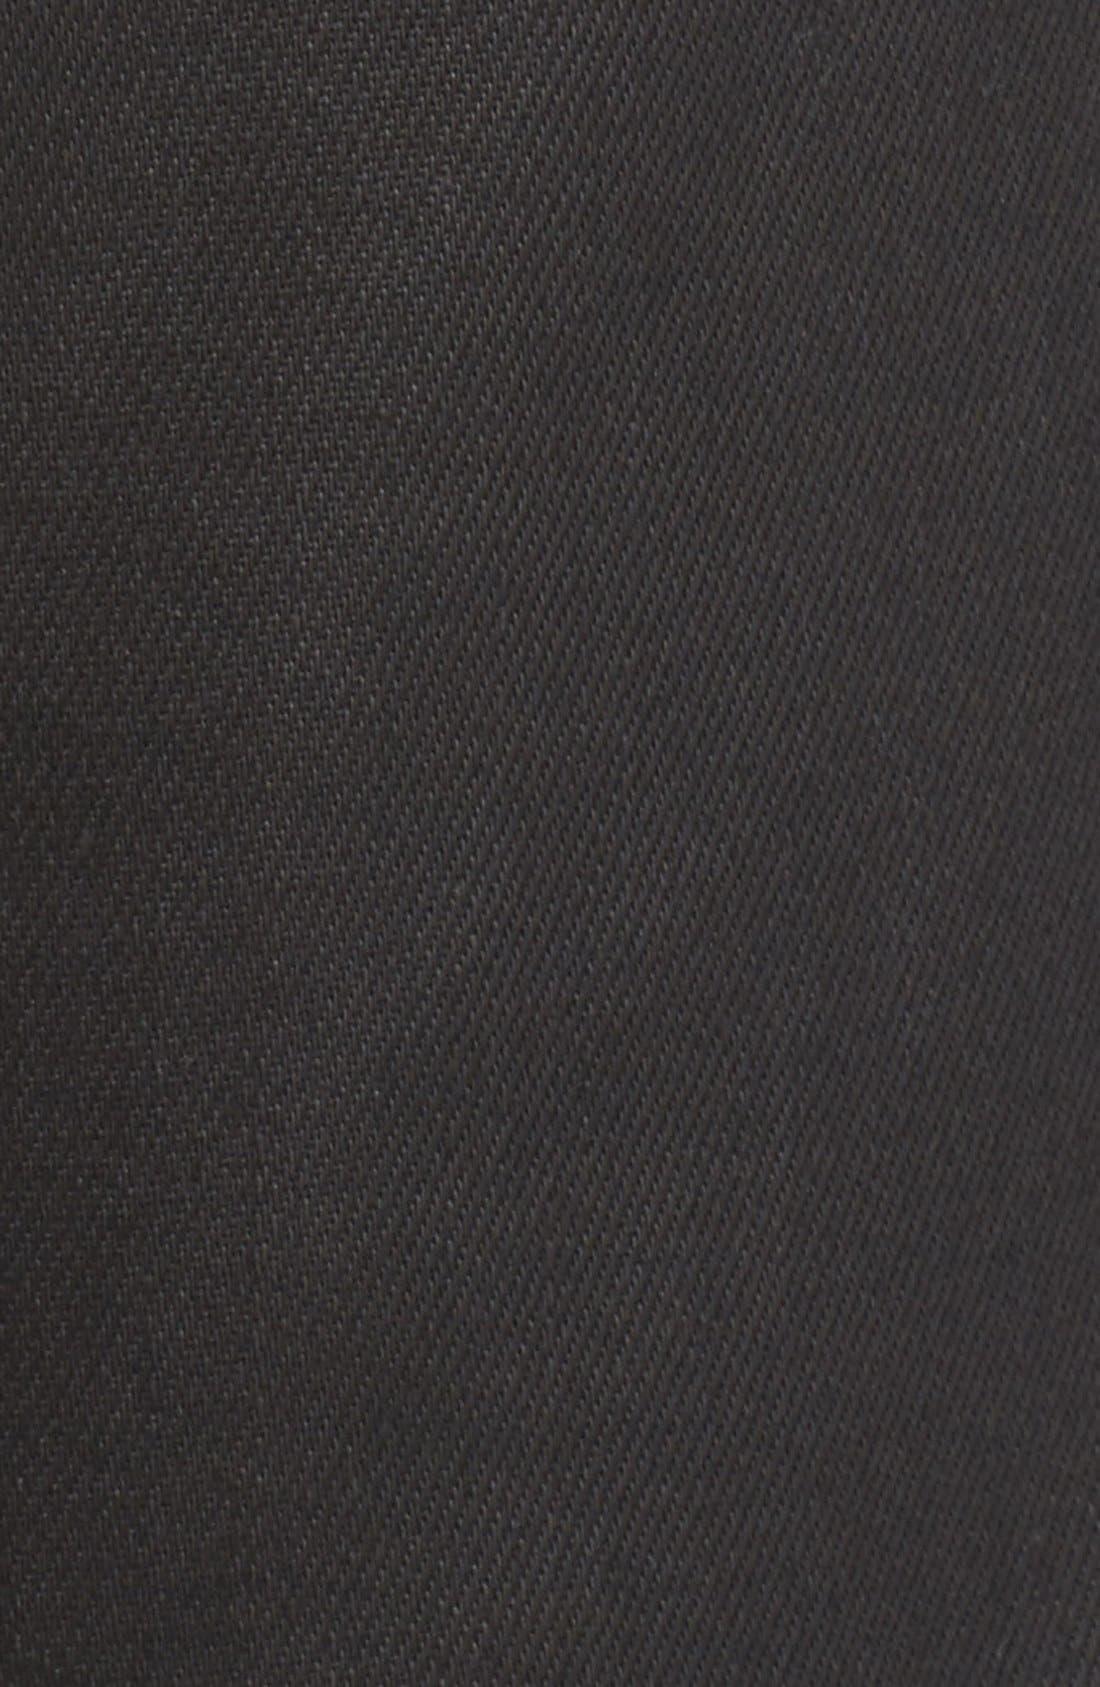 Westham Raw Stretch Denim Moto Jeans,                             Alternate thumbnail 4, color,                             001